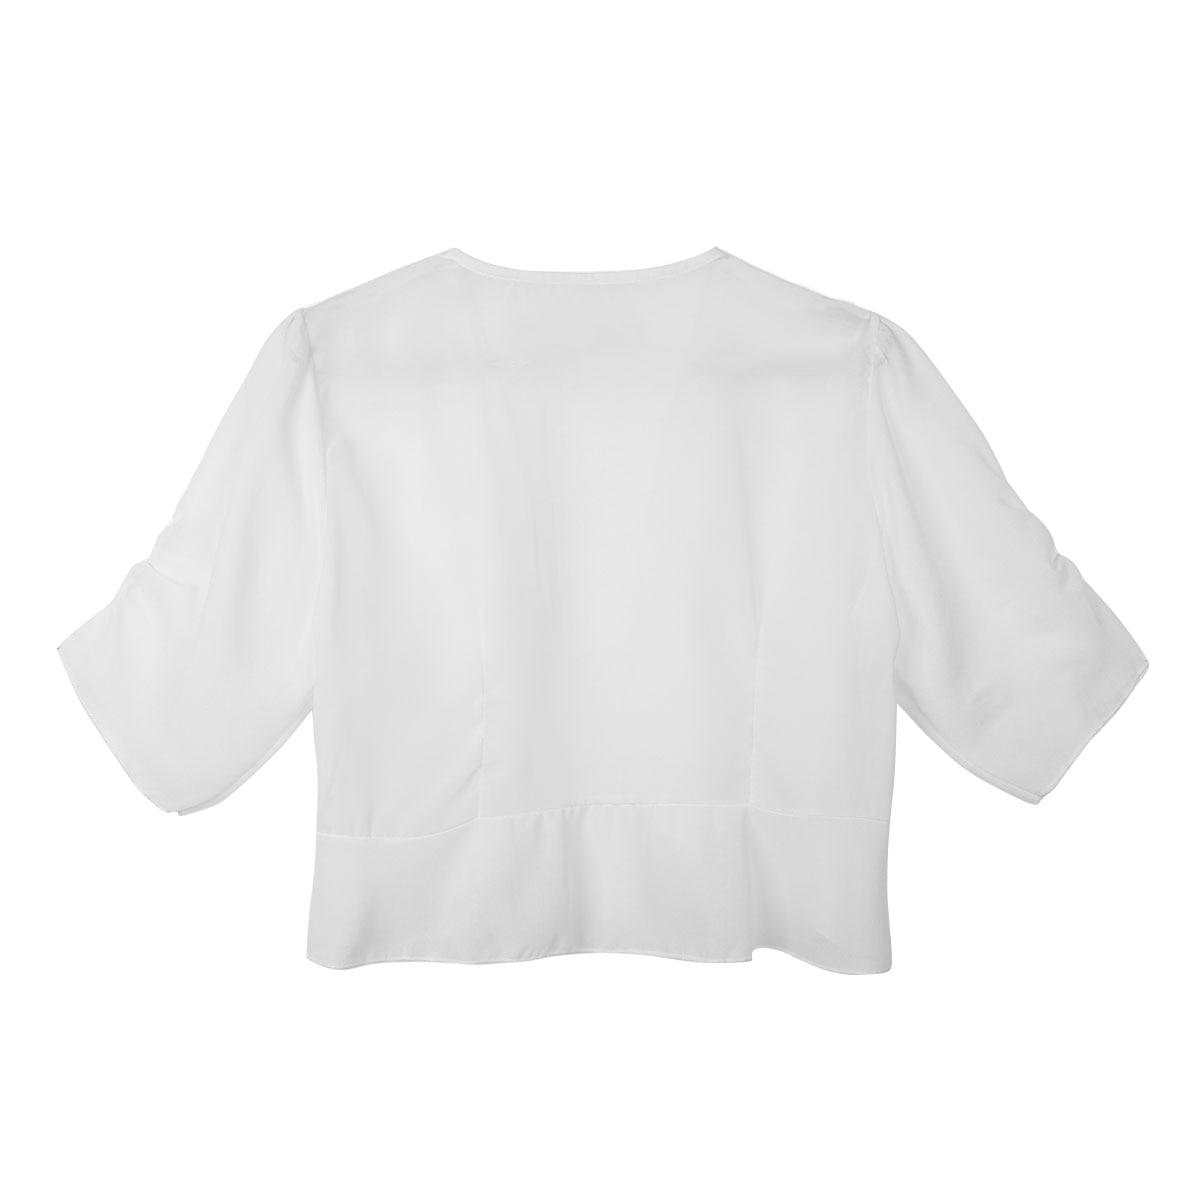 726f551ceef61 Aliexpress.com : Buy 2019 Women Fashion Half Sleeve Open Front Sheer Bolero  Shrug Shawl Cropped Chiffon Slim Cardigan Top Casual Coats Women Clothing  from ...